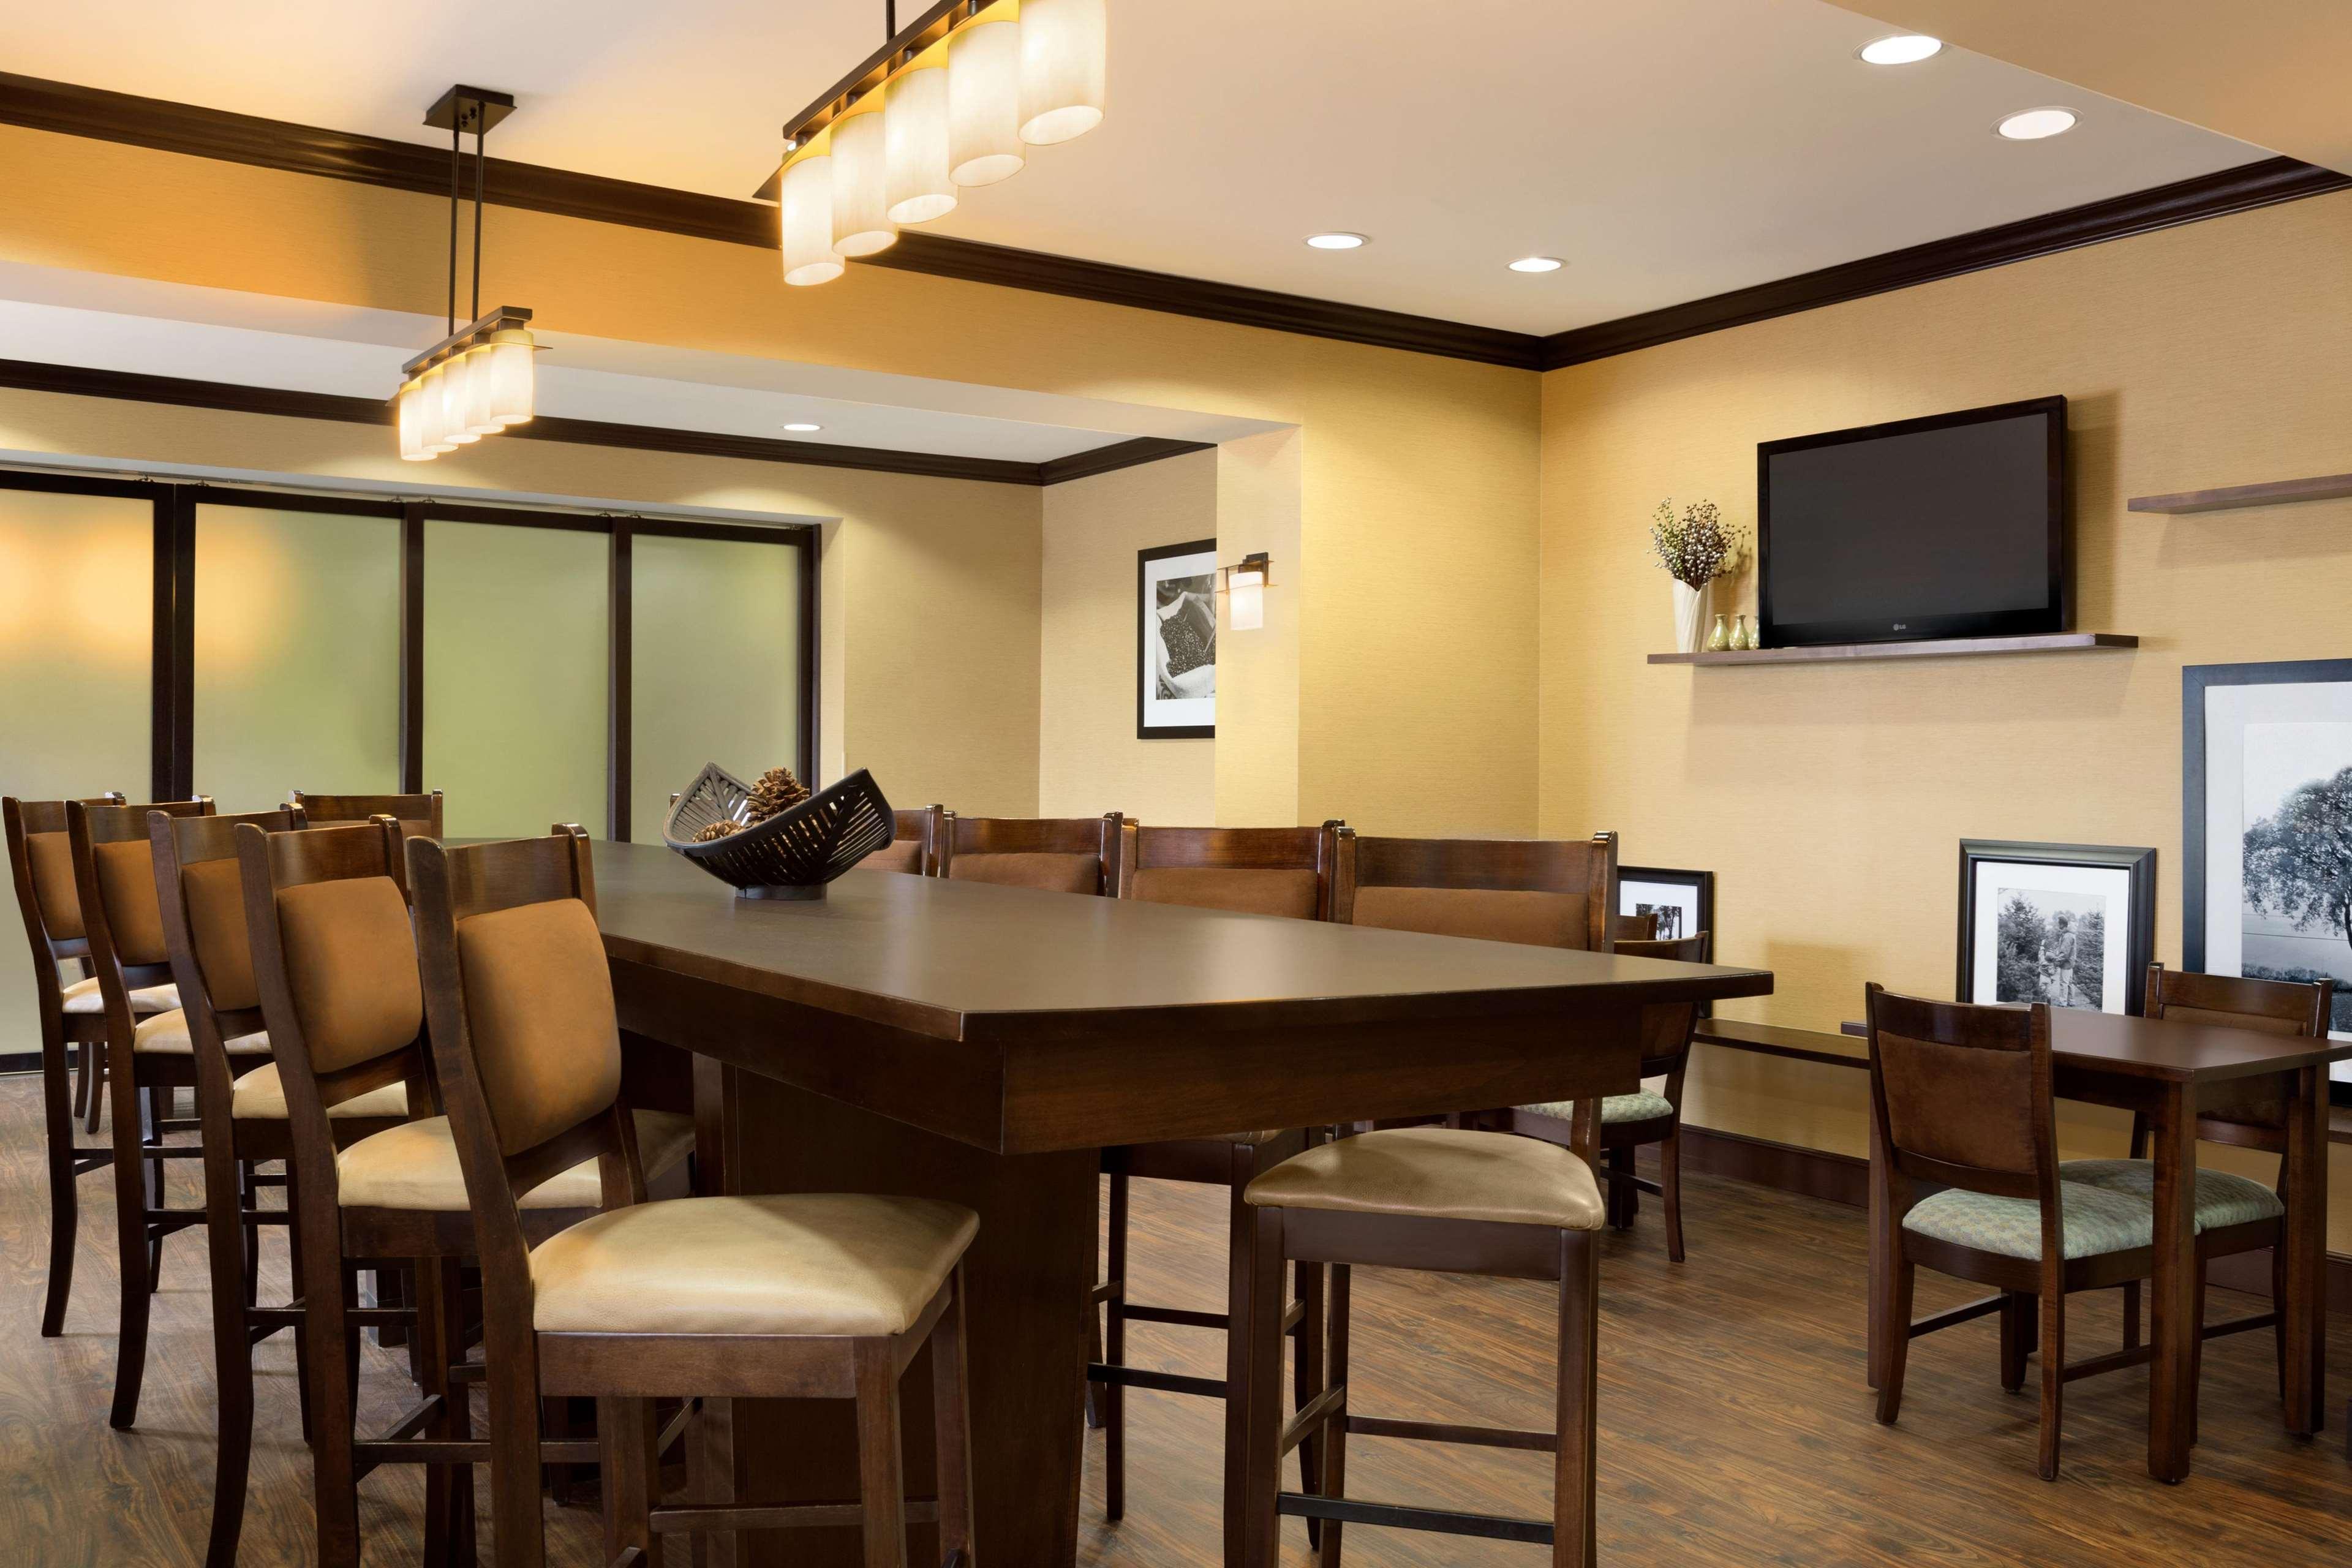 hampton inn stow stow ohio oh. Black Bedroom Furniture Sets. Home Design Ideas